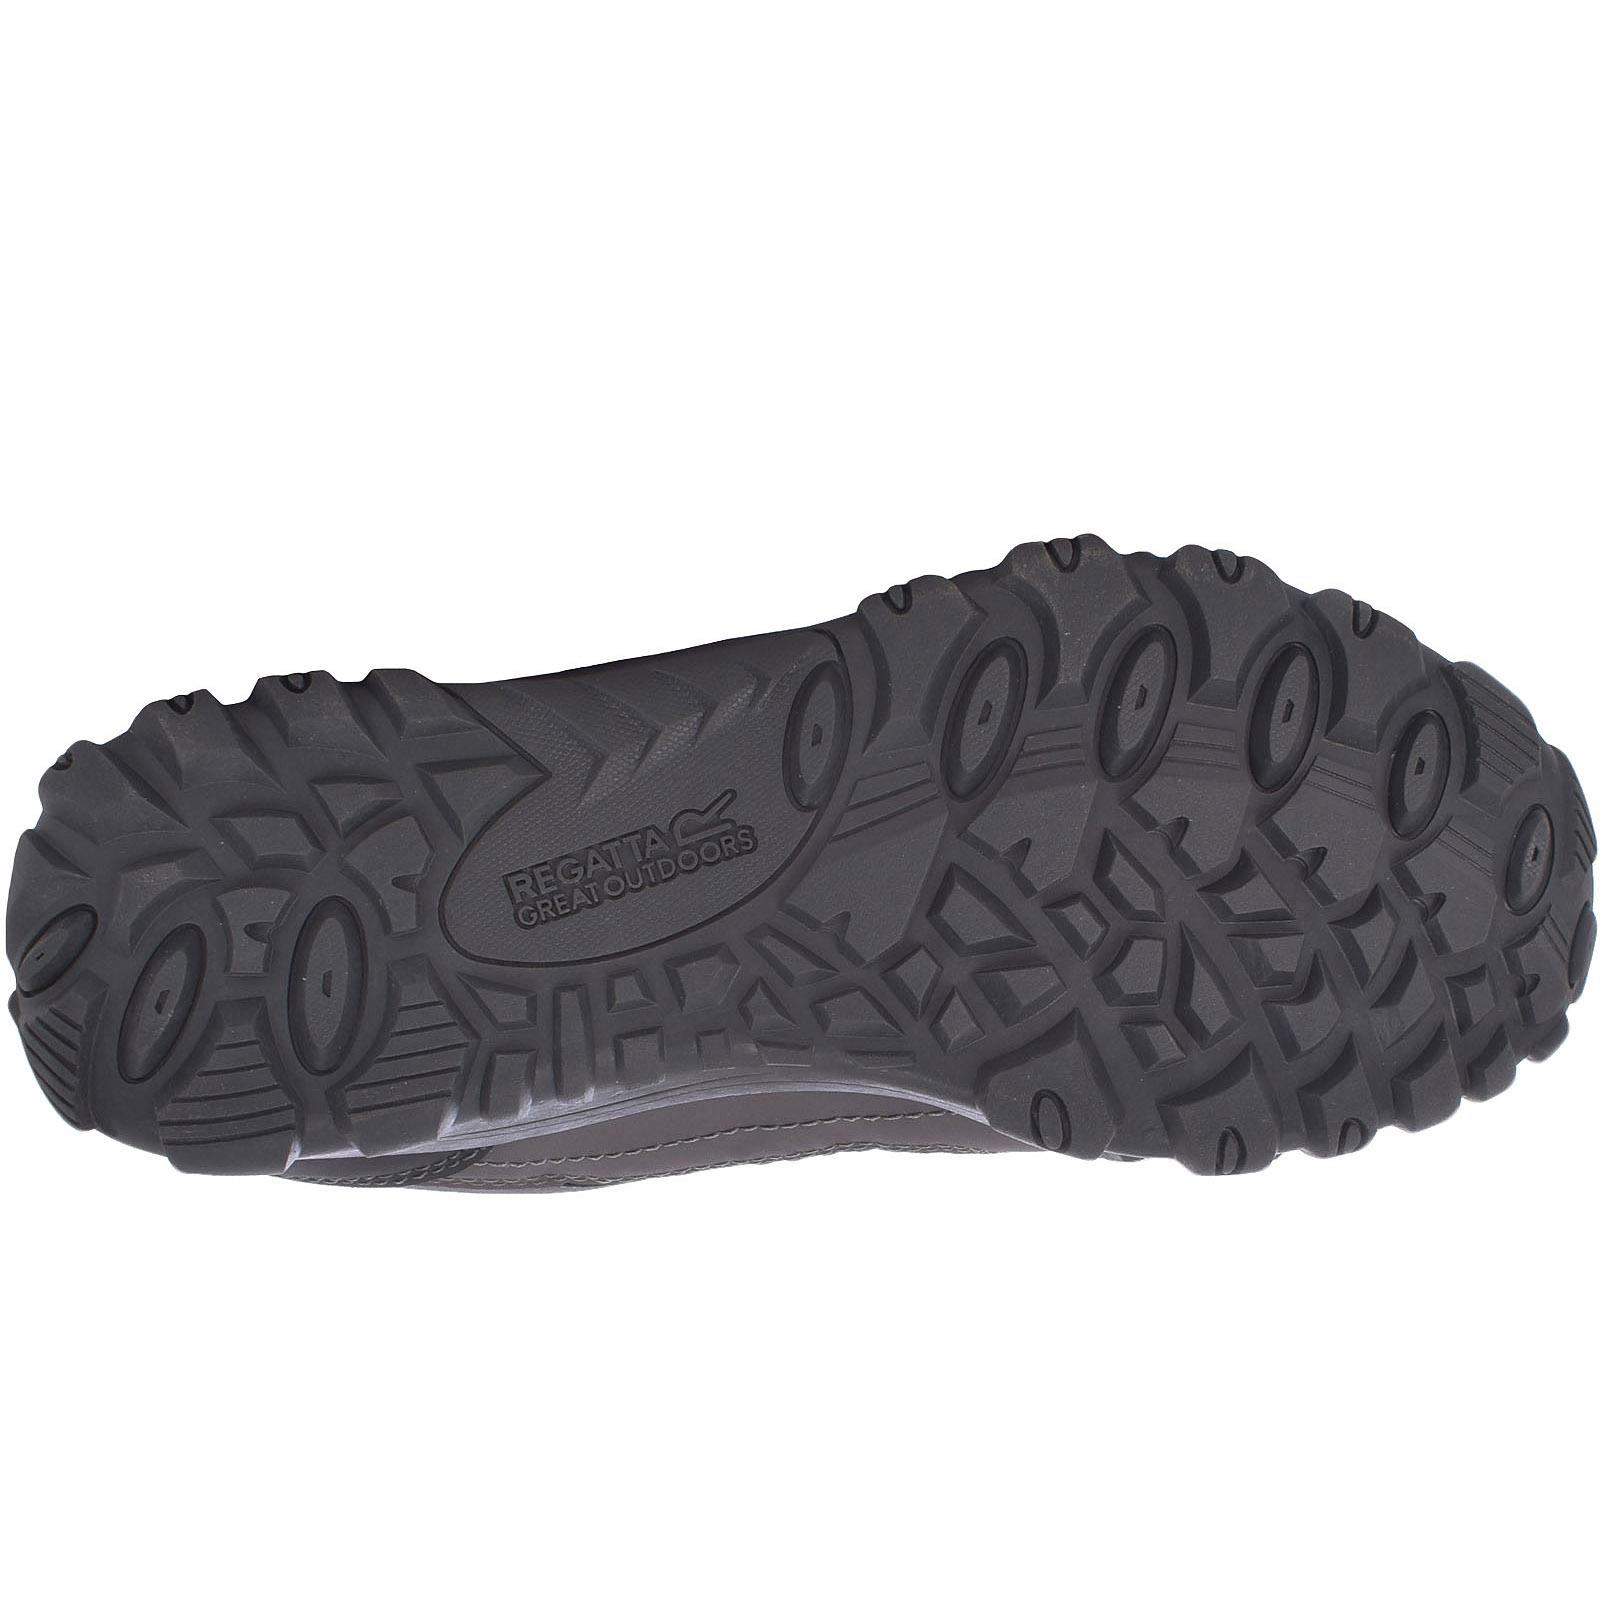 Regatta Womens Edgepoint III Waterproof Outdoor Walking Hiking Shoes Granite